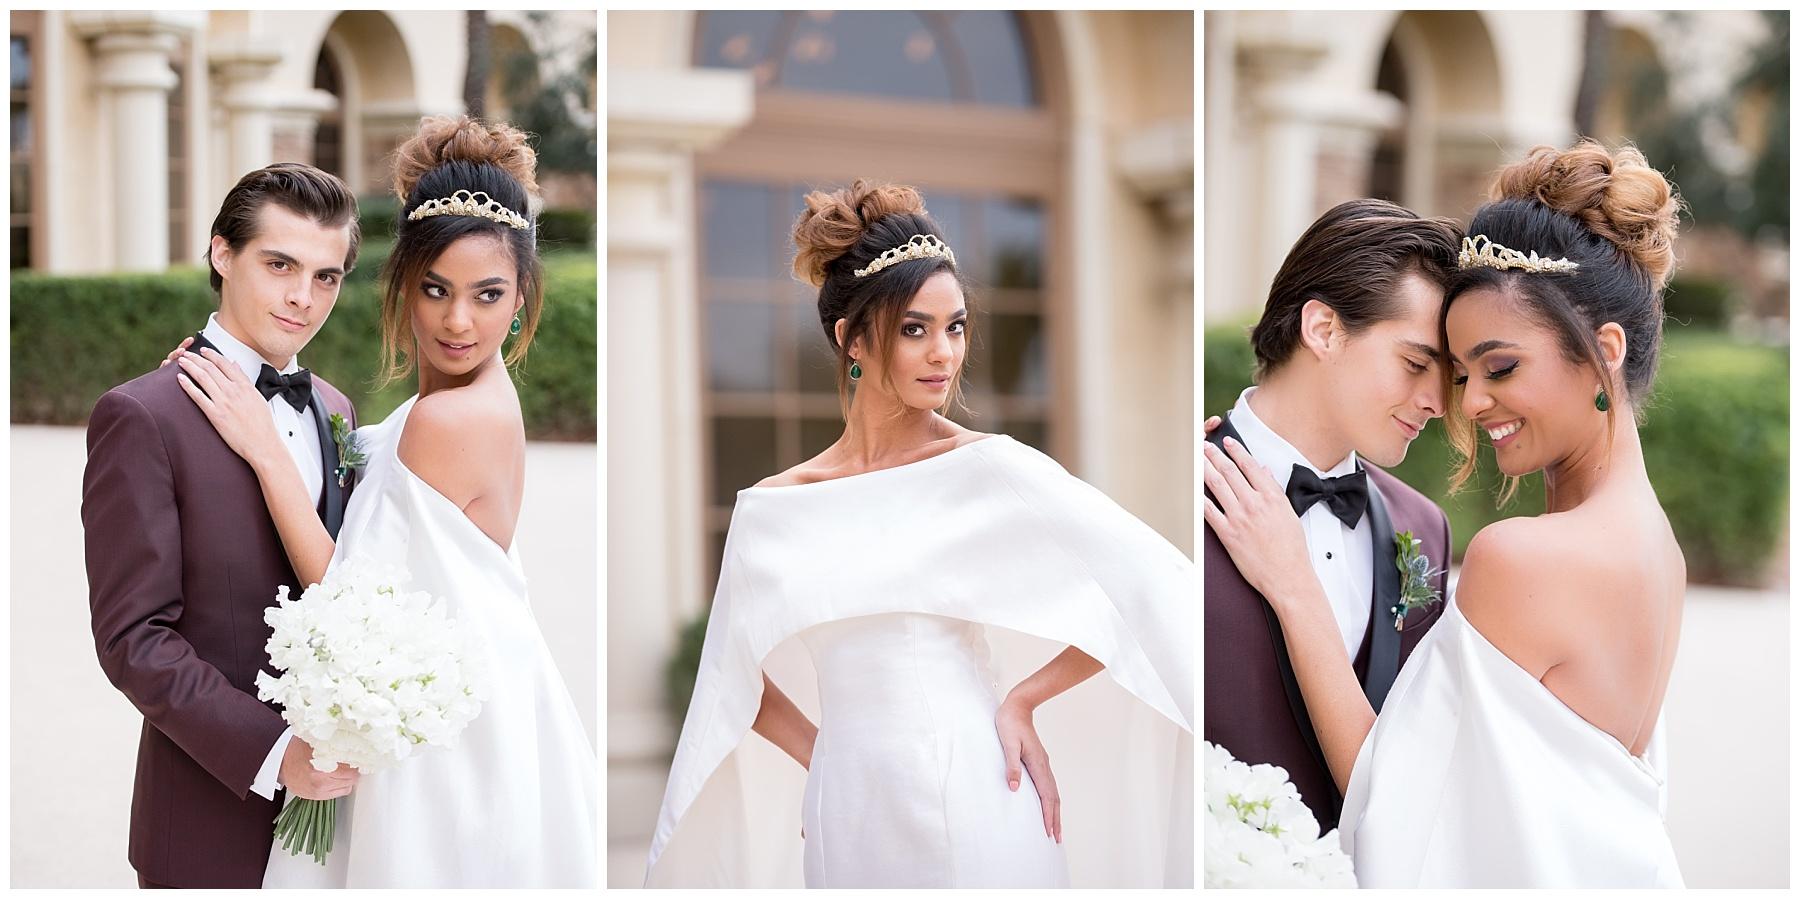 royal wedding hair and makeup las vegas (16).jpg